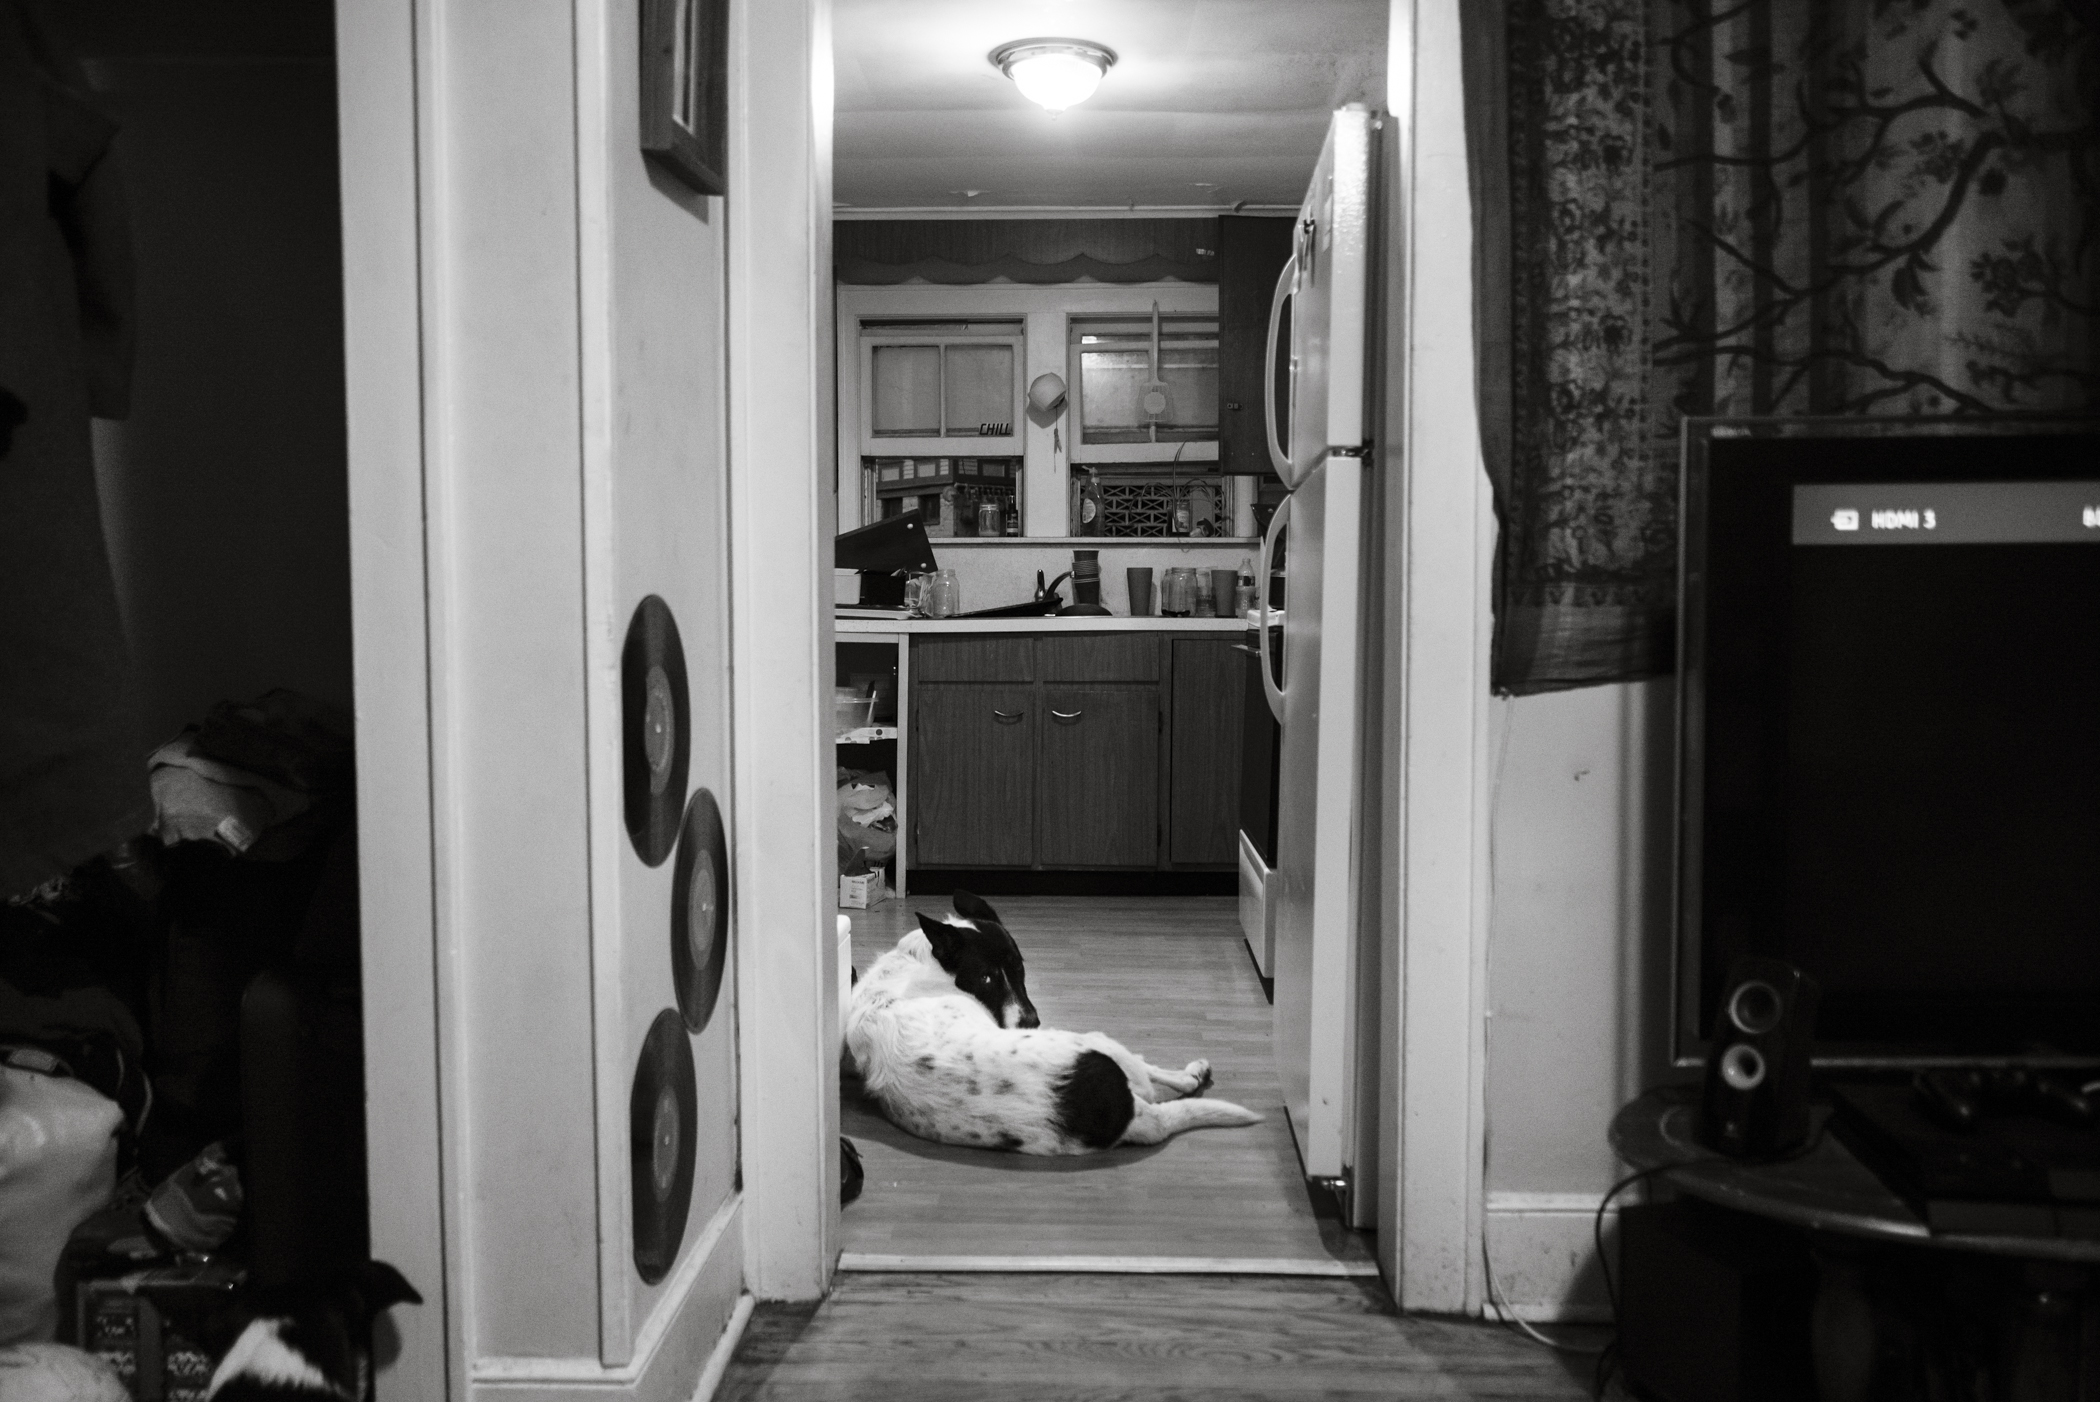 04202014-GangofThievesThunderfunk-JuliaLuckettPhotography-65.jpg